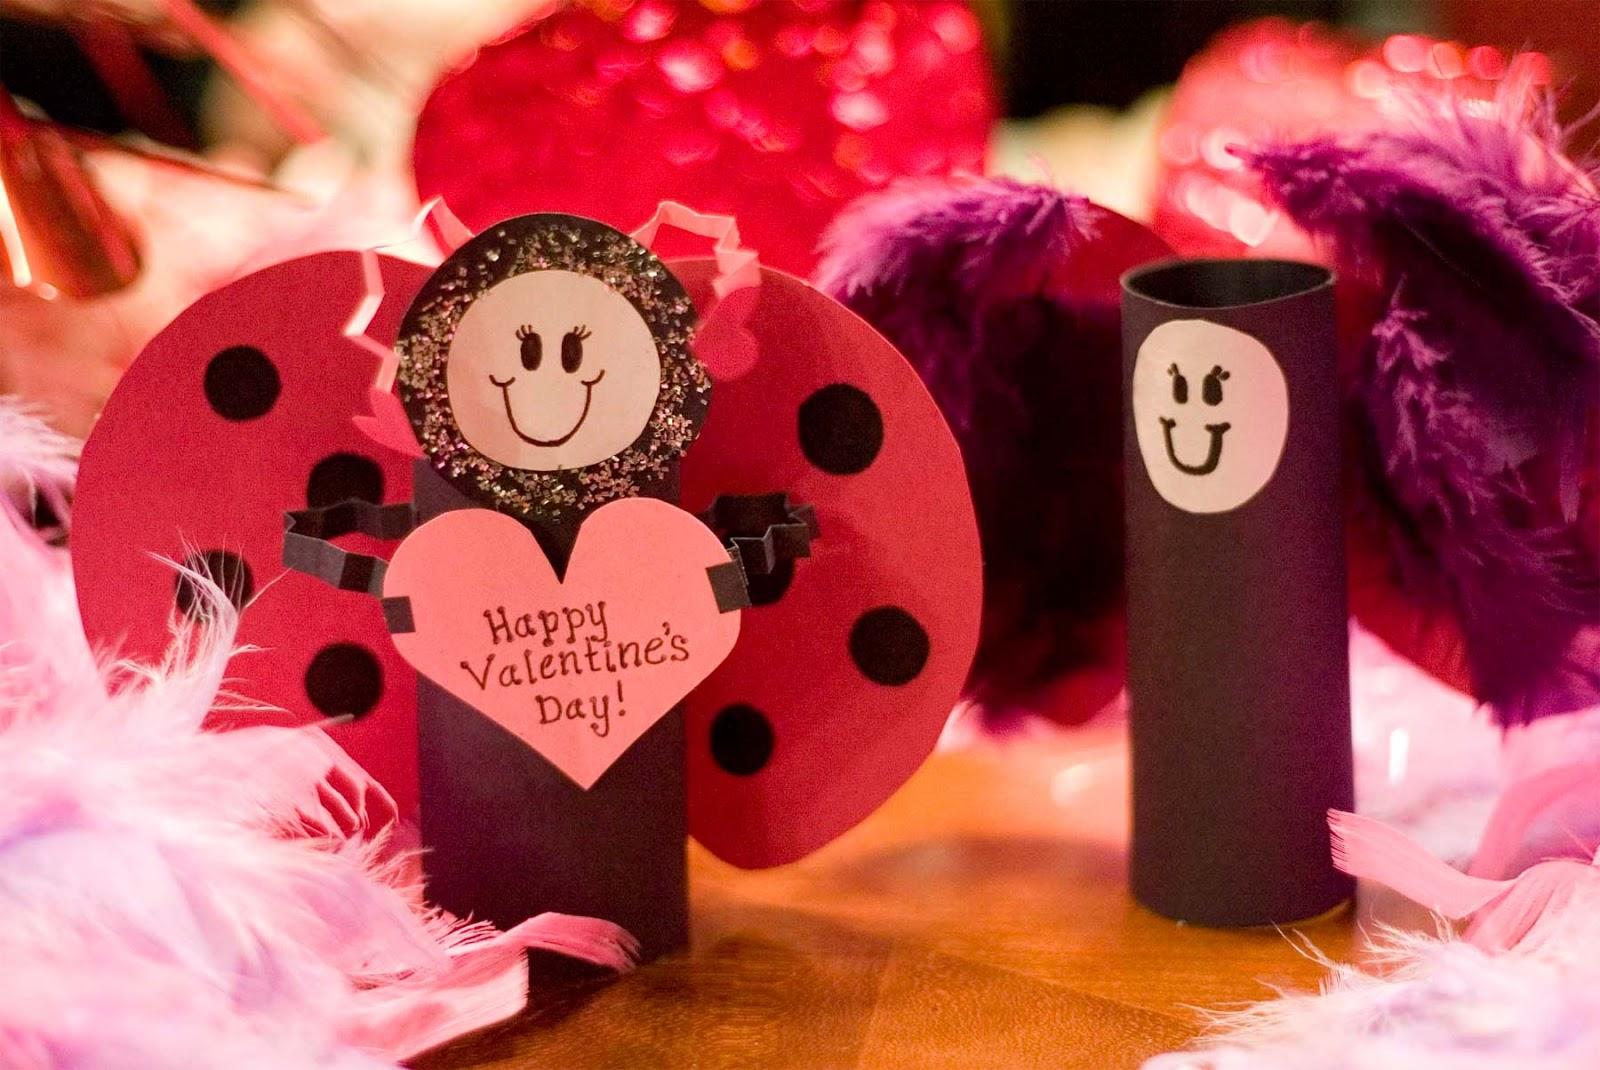 Preschool craft ideas for valentines day - Valentine S Day Crafts Idea For Kids